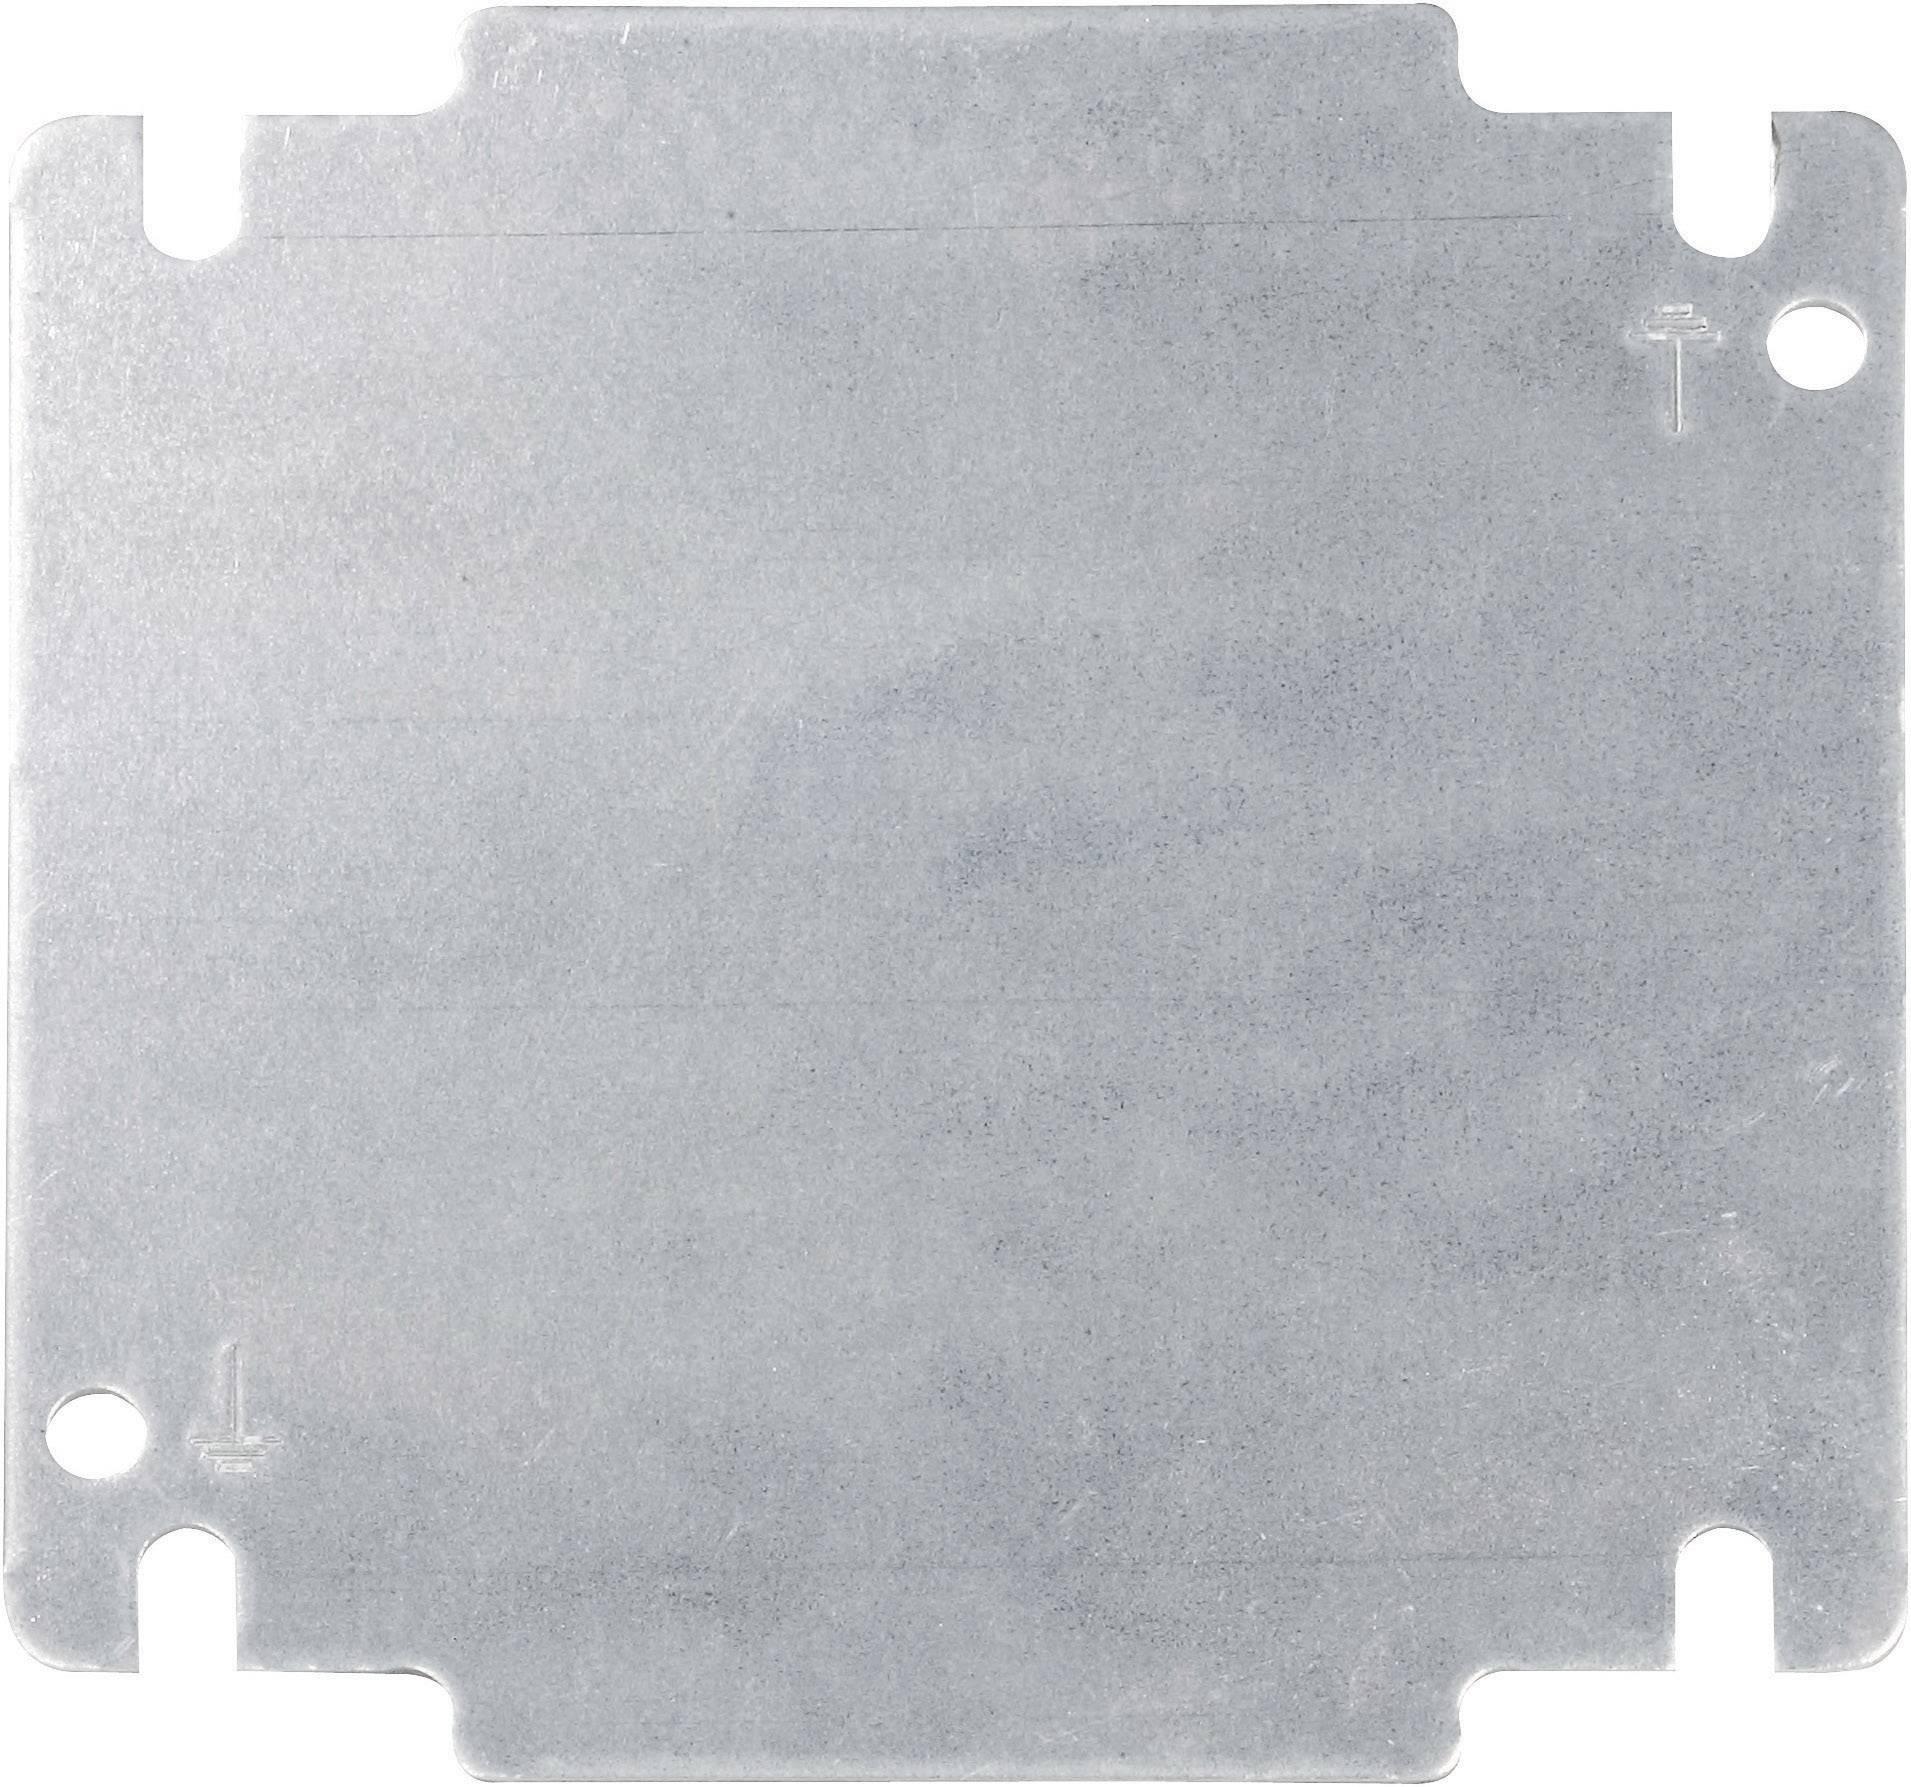 Montážna doska oceľový plech kov Schroff INLINE 32405-026, (d x š) 181 mm x 181 mm